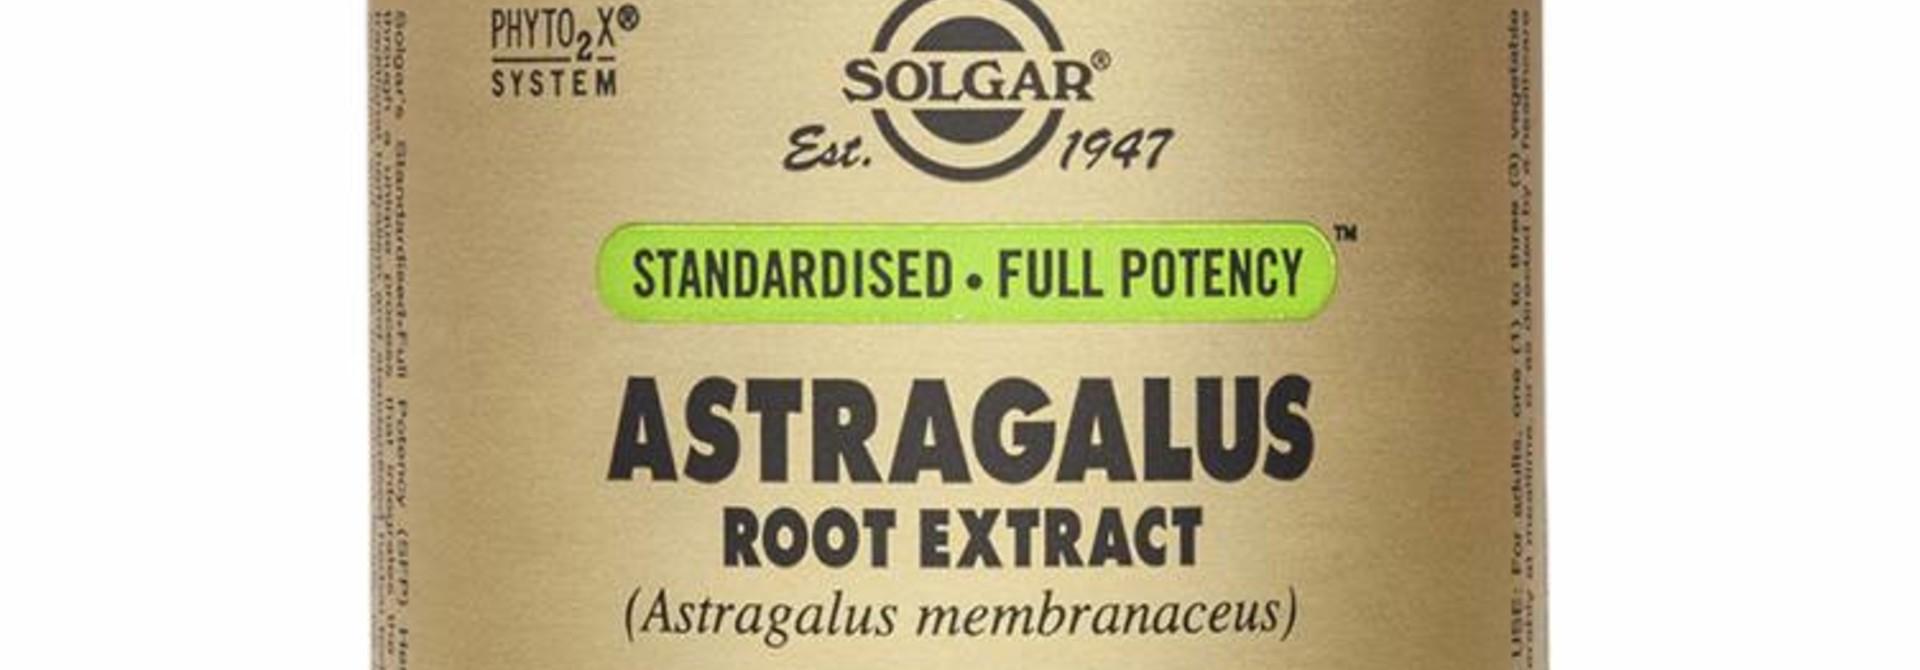 Astragalus Root Extract 60 plantaardige capsules